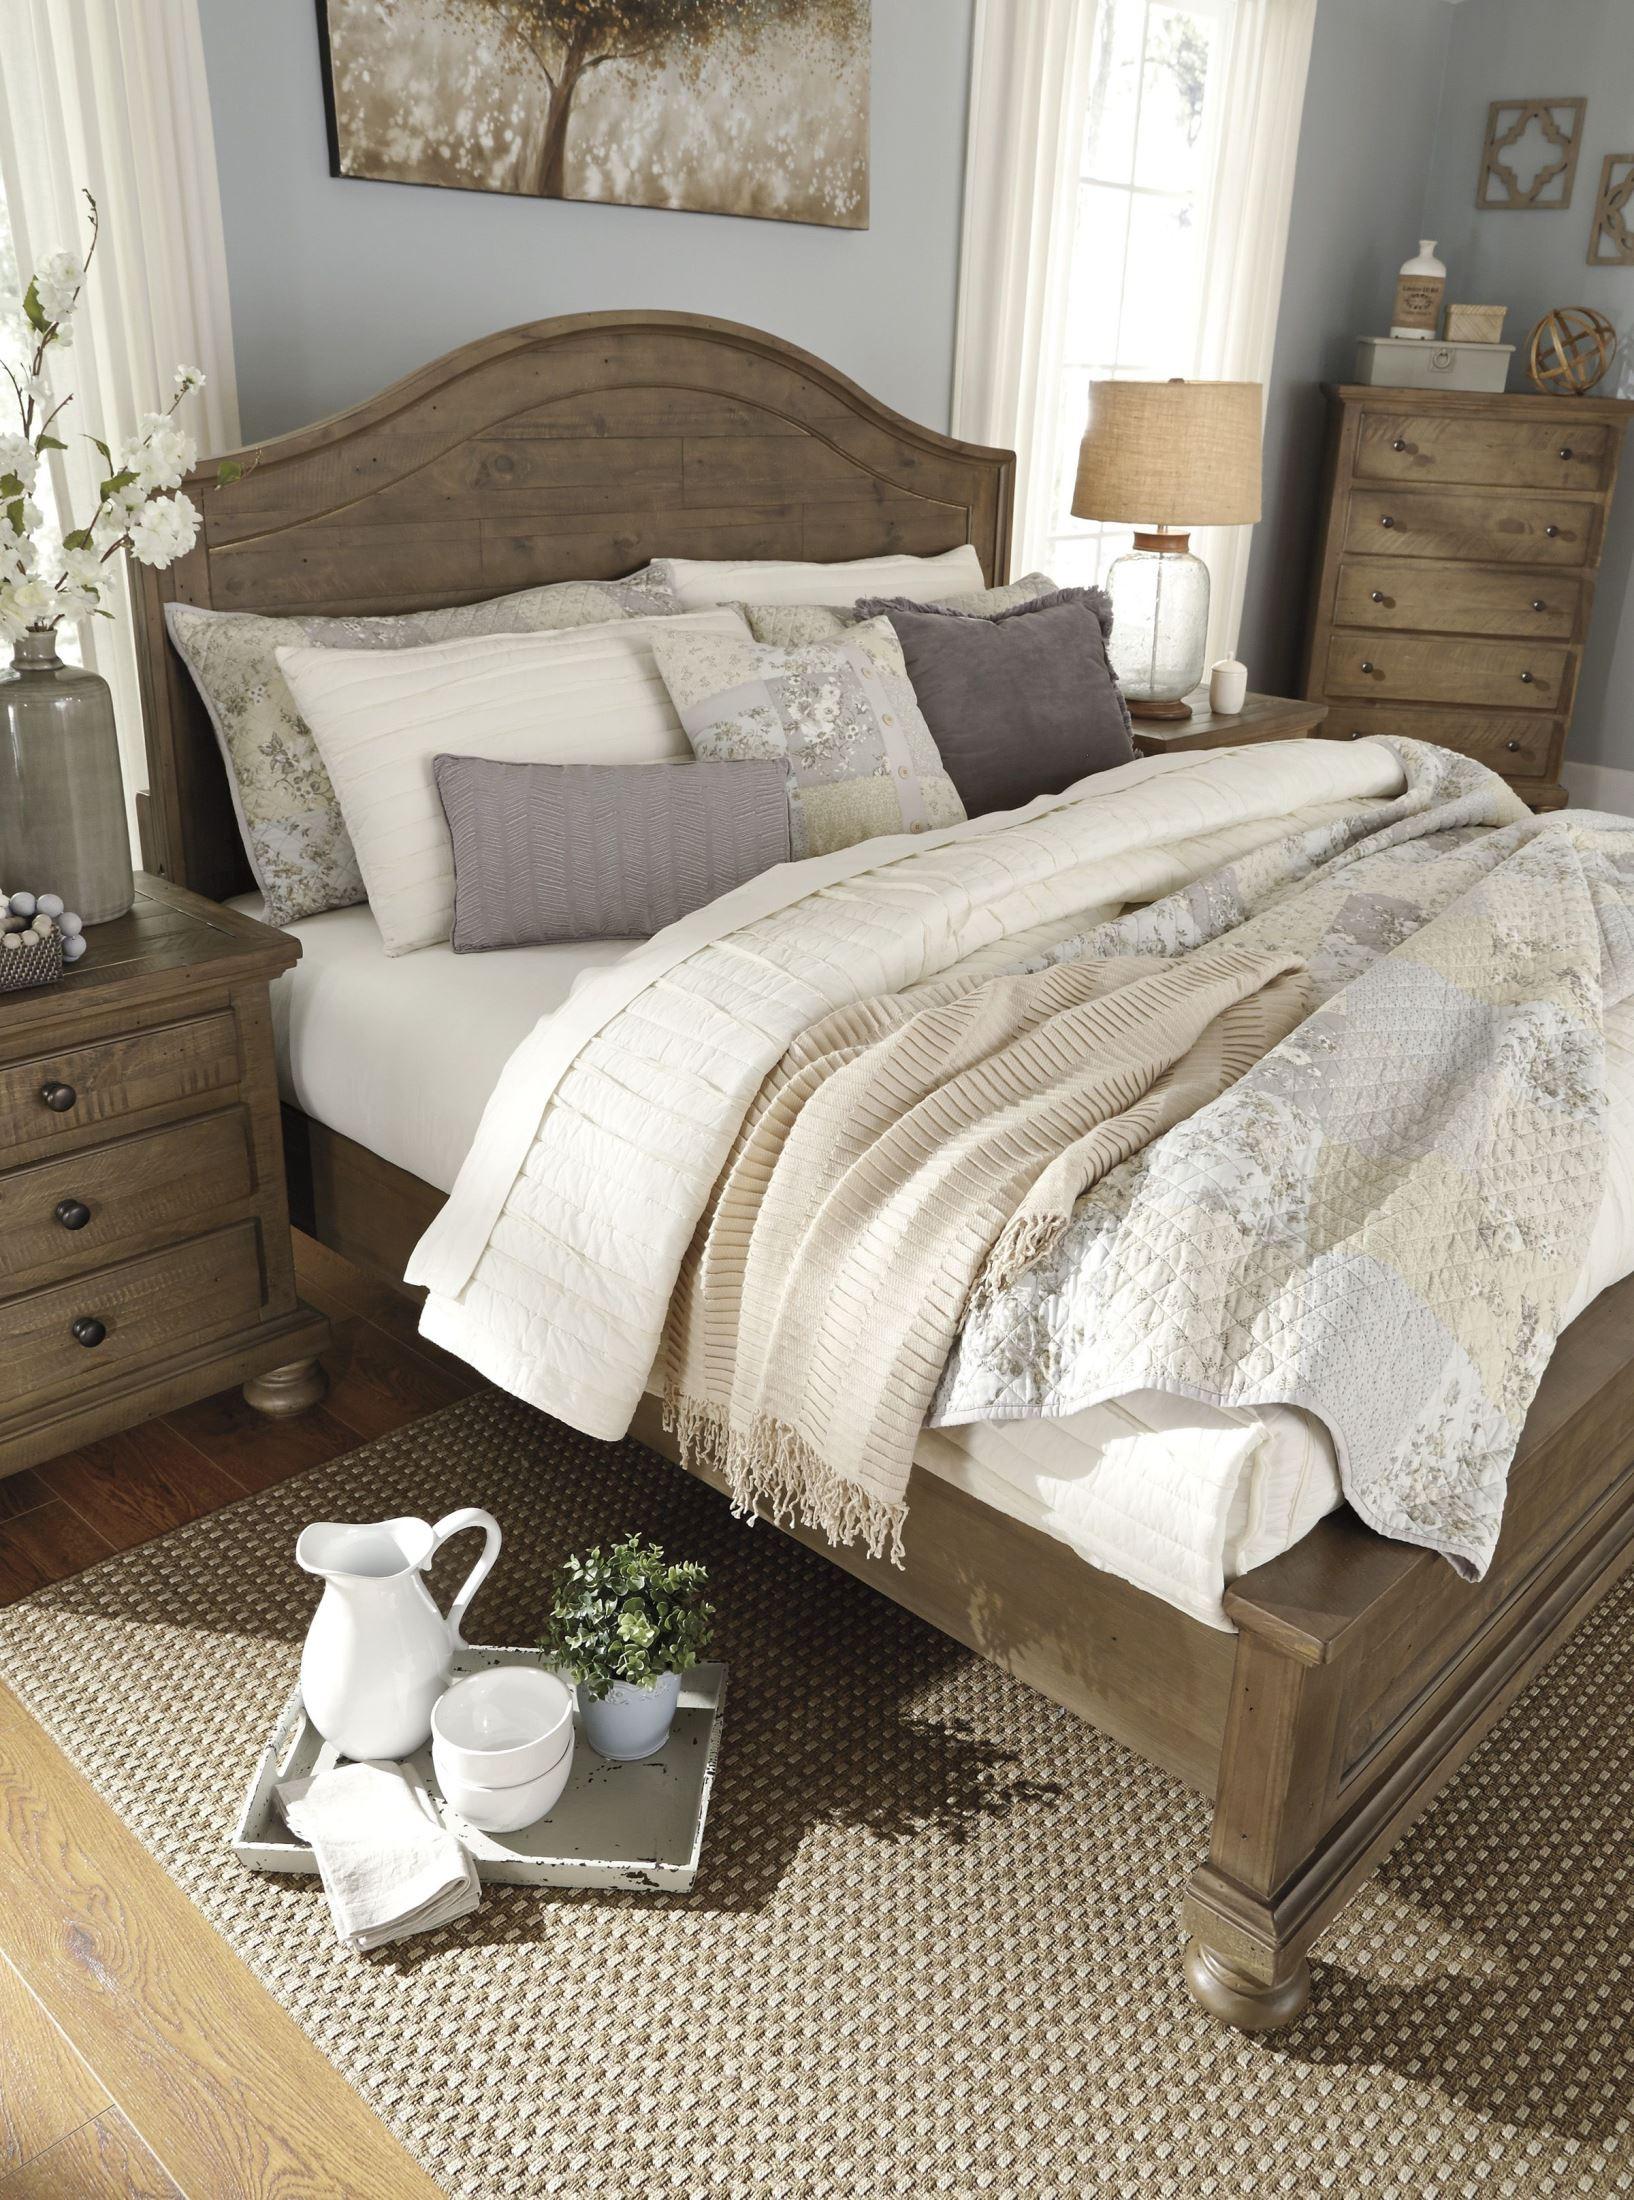 Trishley Light Brown Panel Bedroom Set, B659-57-54-96, Ashley